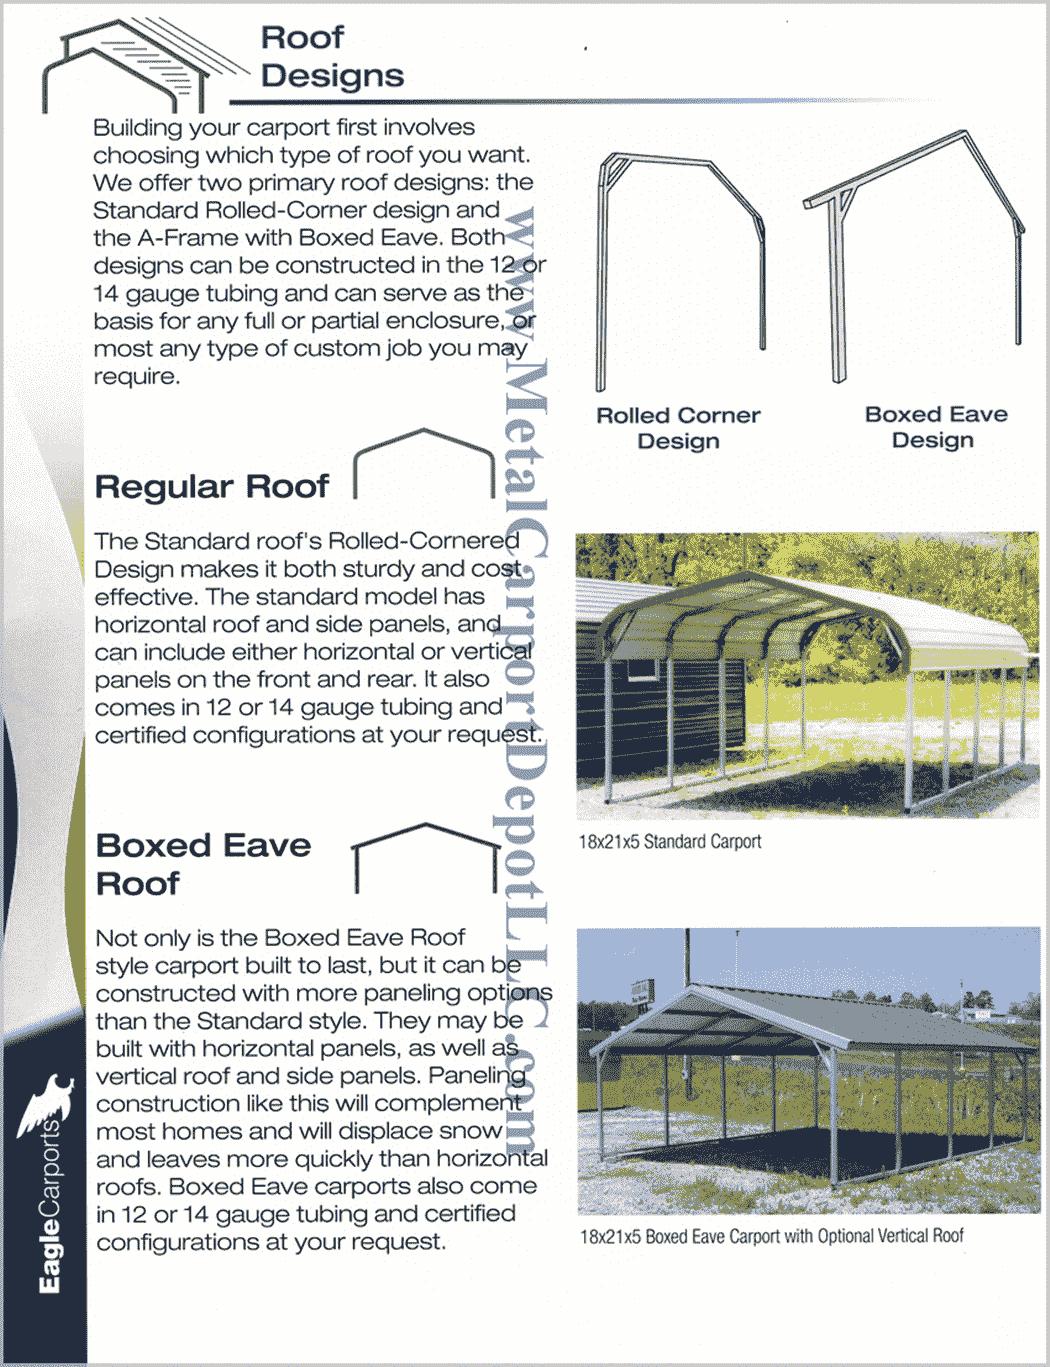 Metal Carport & Building Roof Designs Information min